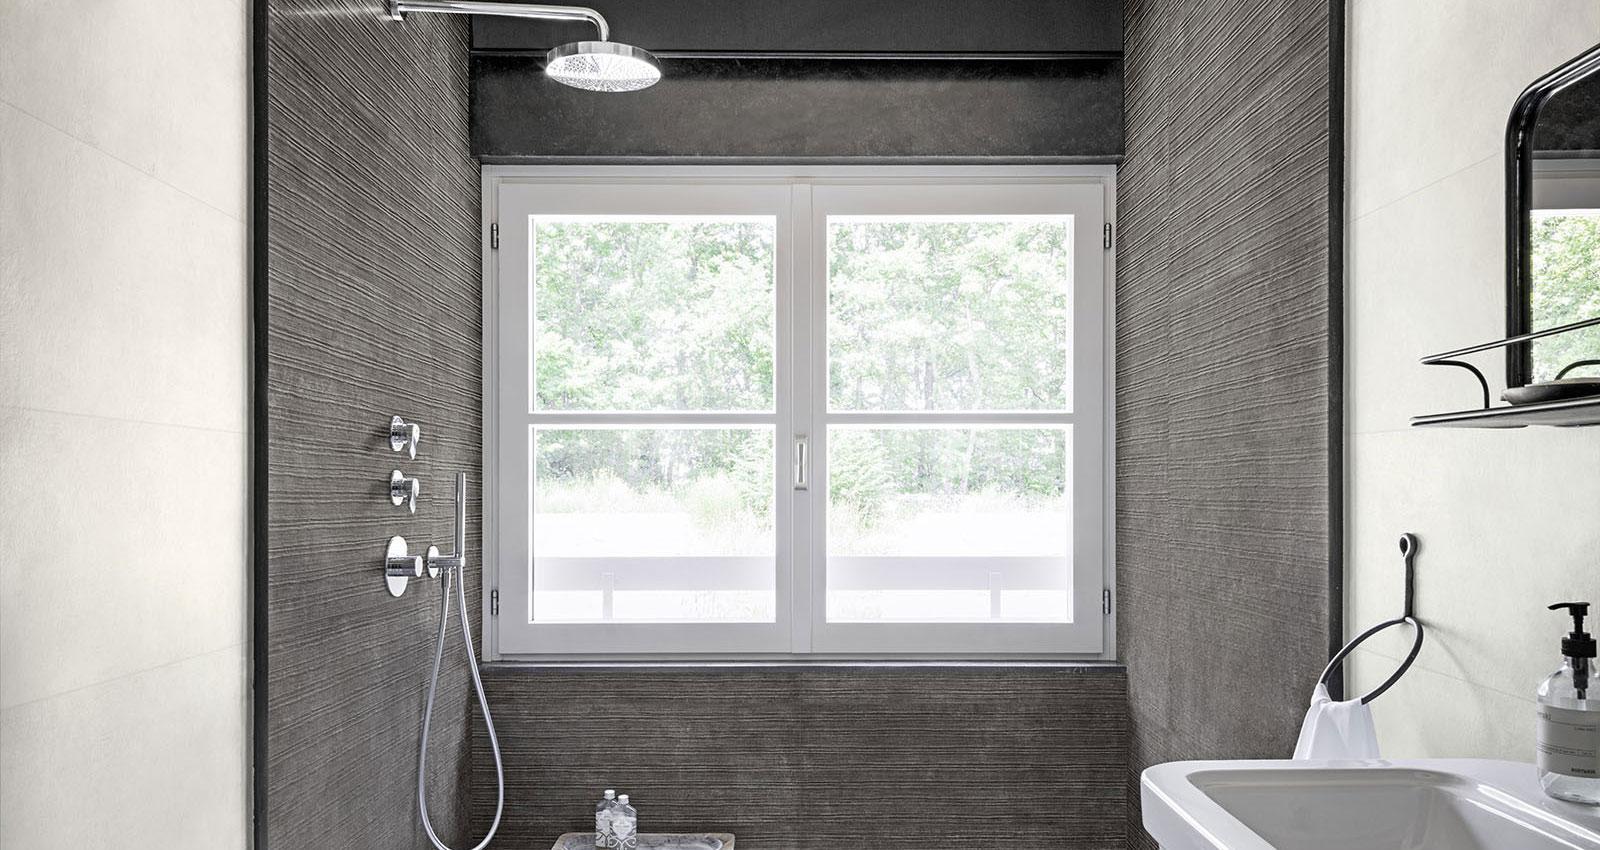 Fresco collection: Plaster Effect Ceramic Tiles | Marazzi